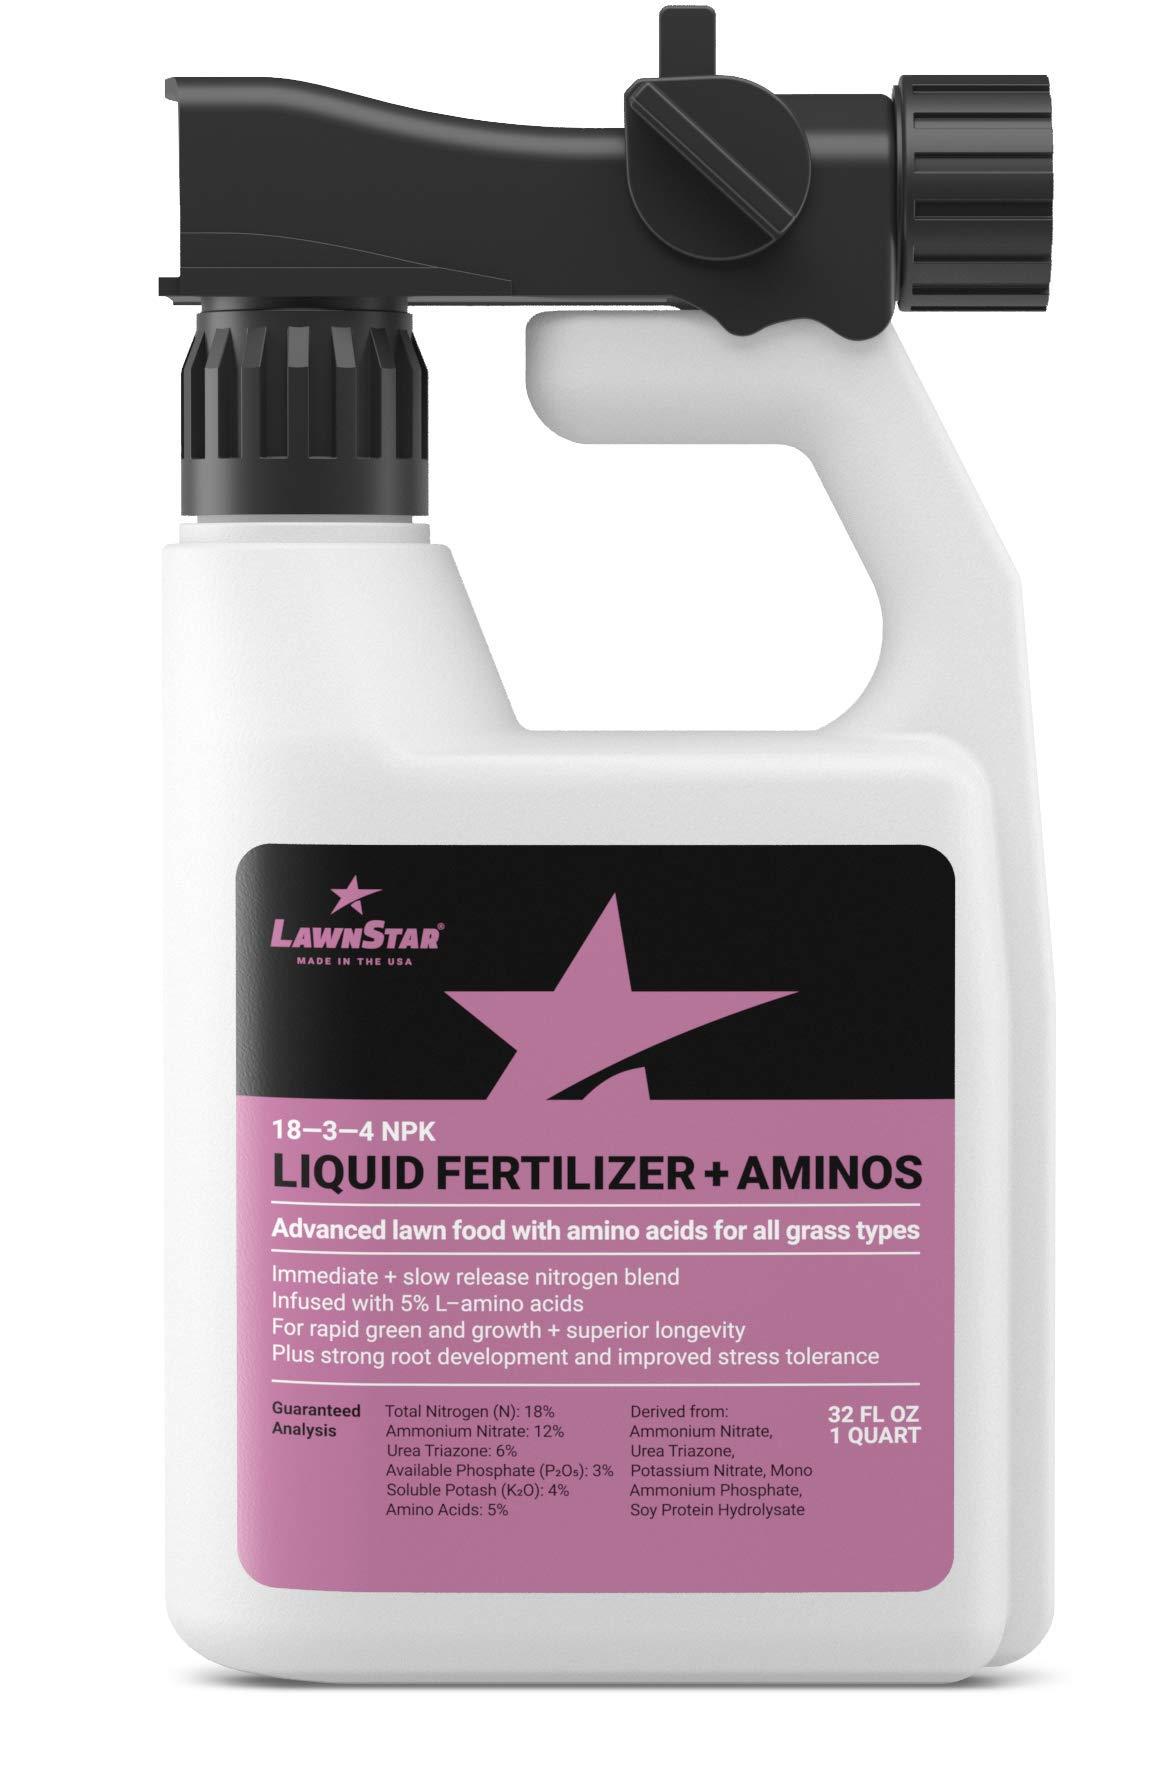 LawnStar Premium 18-3-4 NPK + Amino Acid Lawn Food (32 OZ) - Advanced Spring & Summer Fertilizer - Makes Grass Greener, Conditions Soil - Slow Release N, Liquid Blend, All Grass Types - American Made by Lawn Star